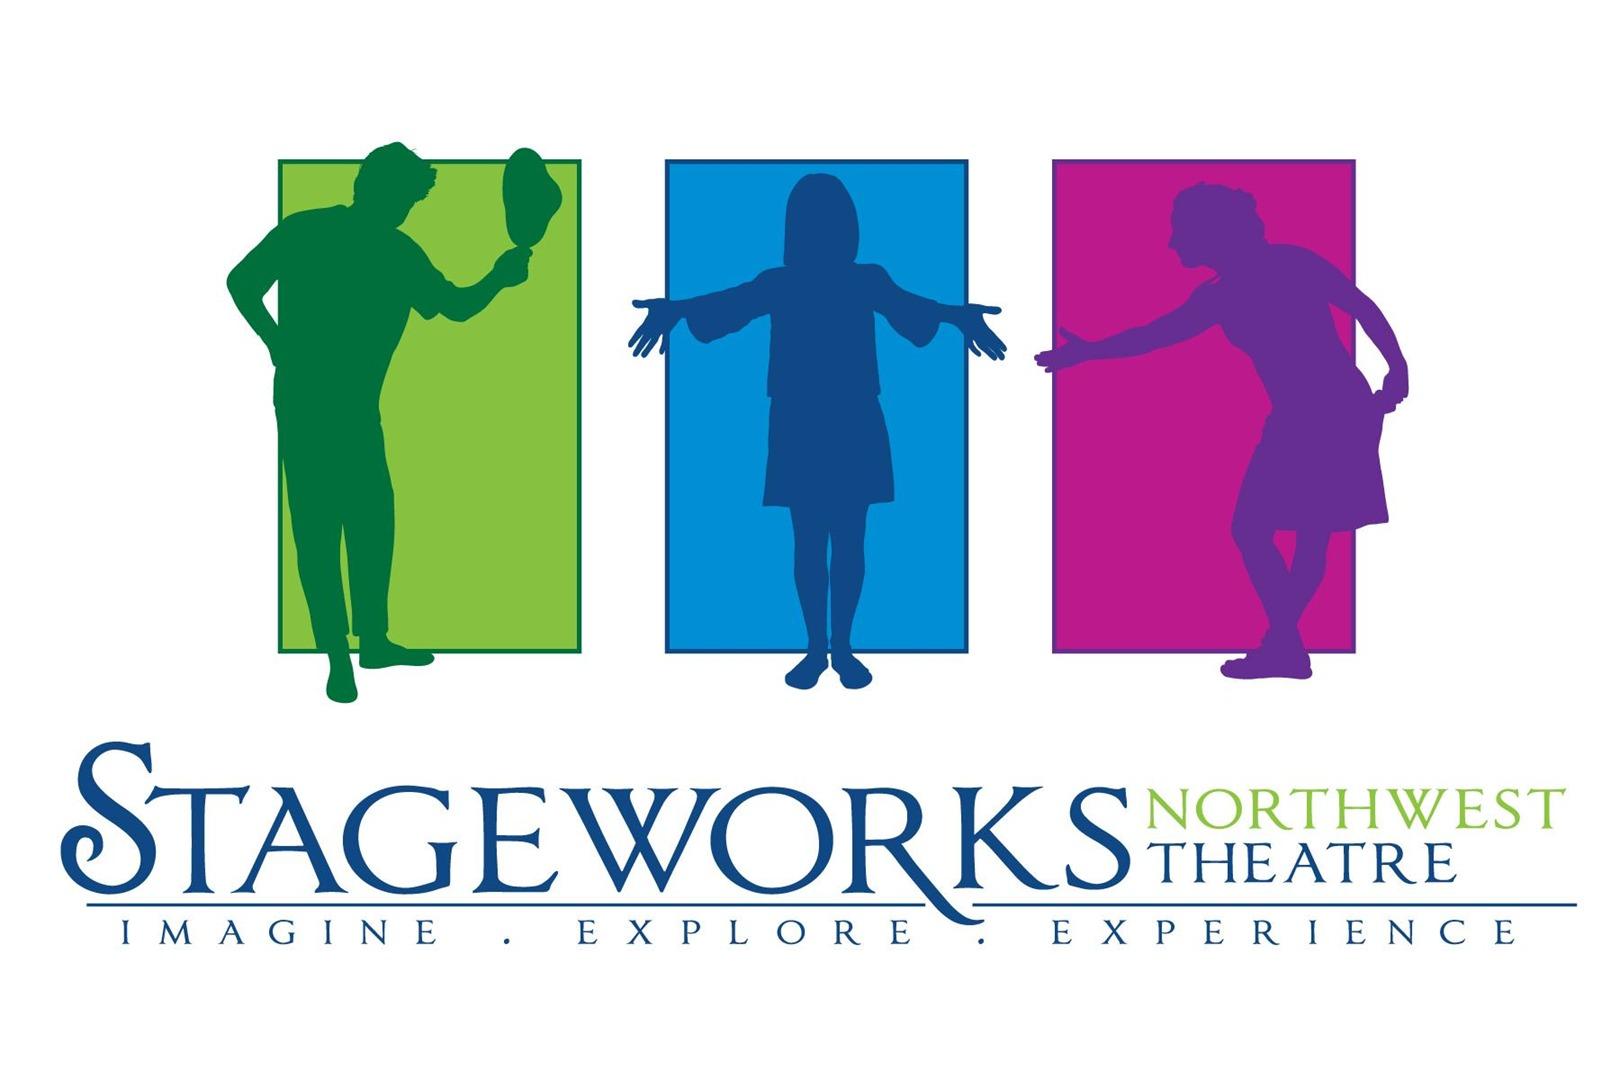 stageworks northwest theatre - Longview WA